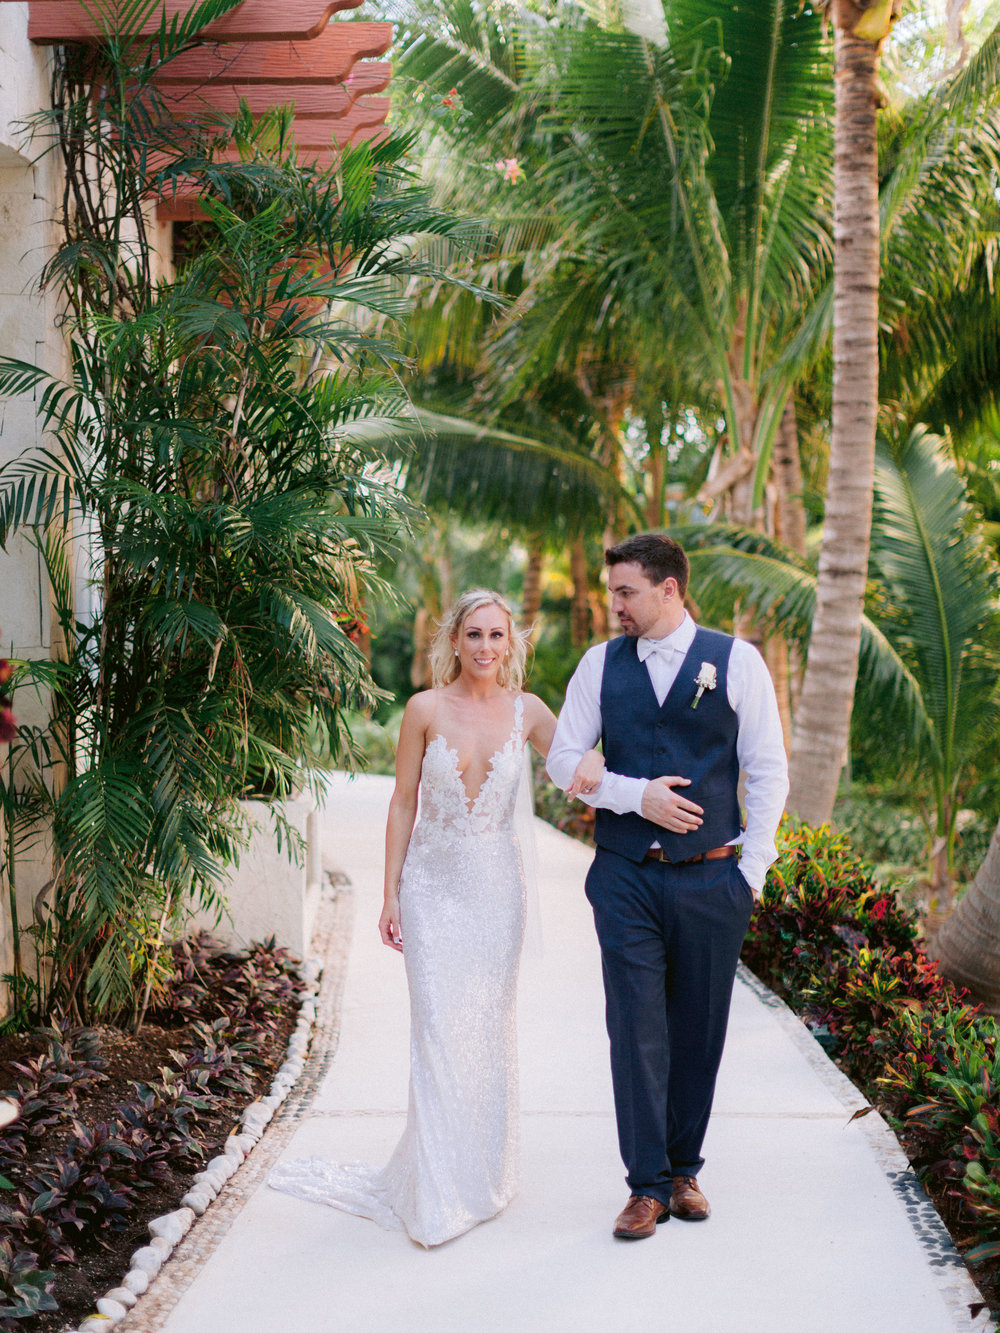 Kim_Jeff_Cancun Wedding_Portraits_Kurtz_Orpia (79 of 178).jpg